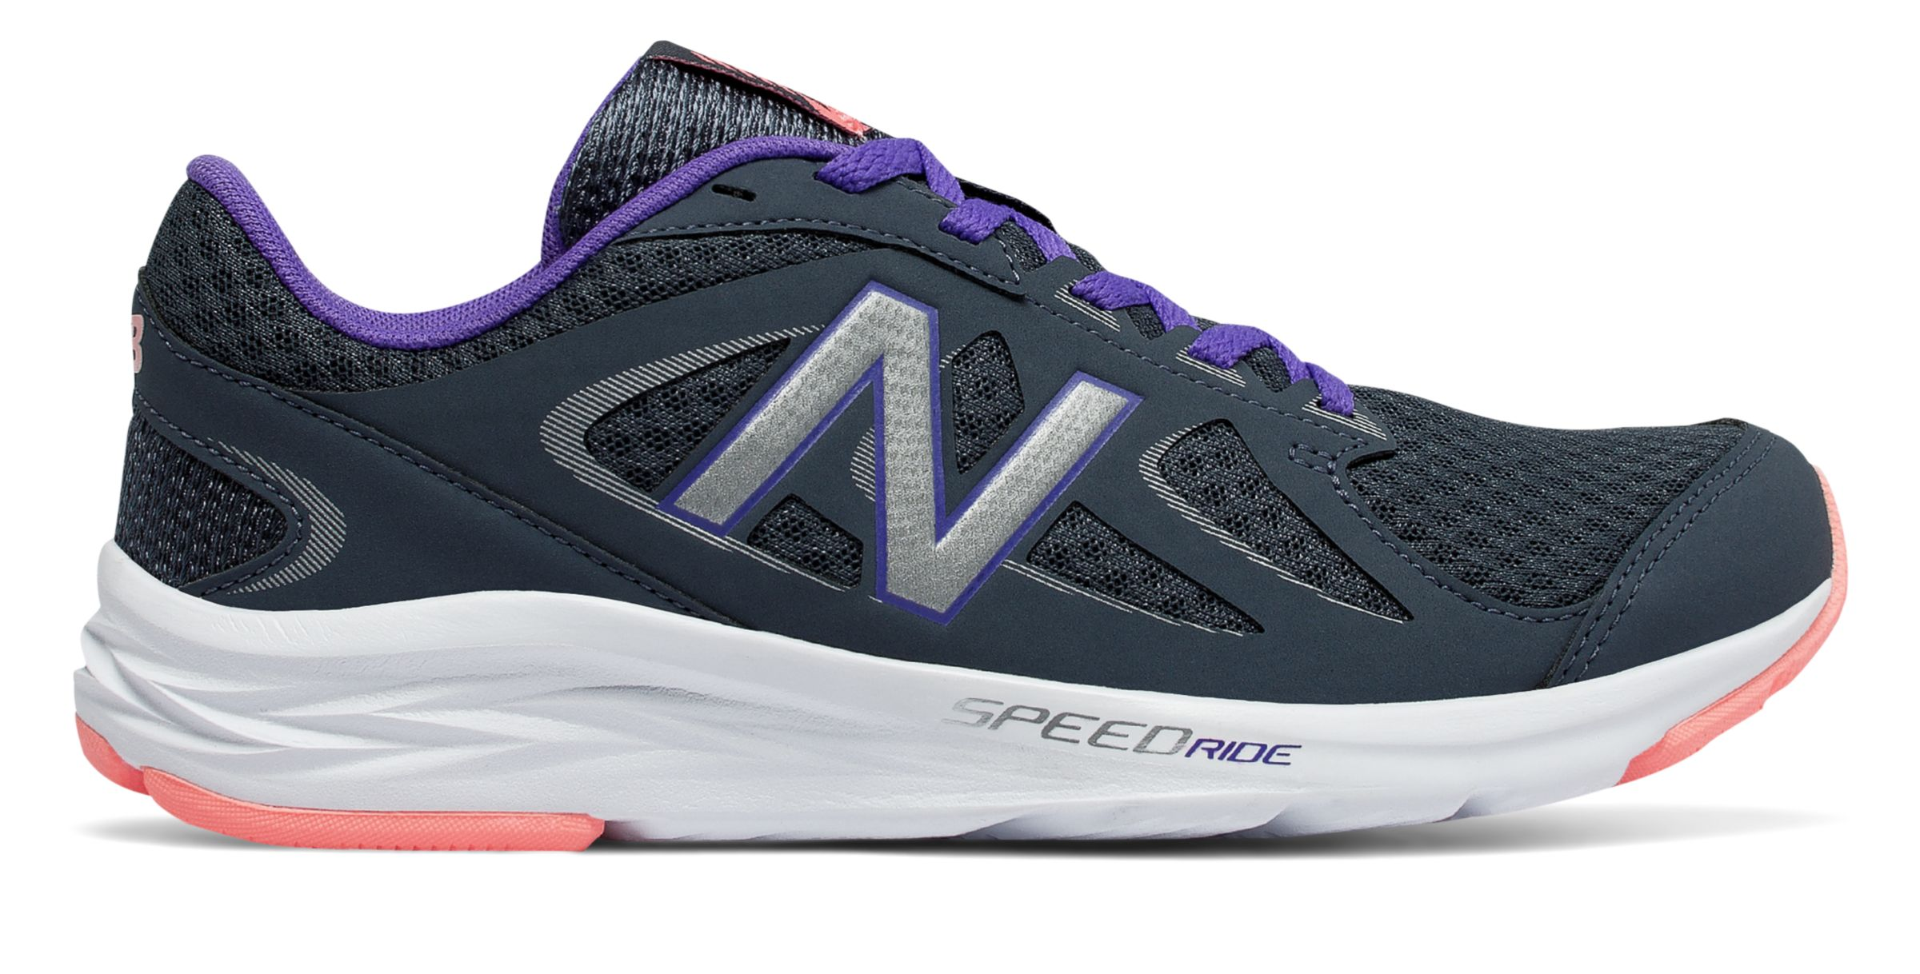 versus Preparación operador  New Balance 490v4 Women's Running Shoes - W490CA4 - Fitness ManiaFitness  Mania